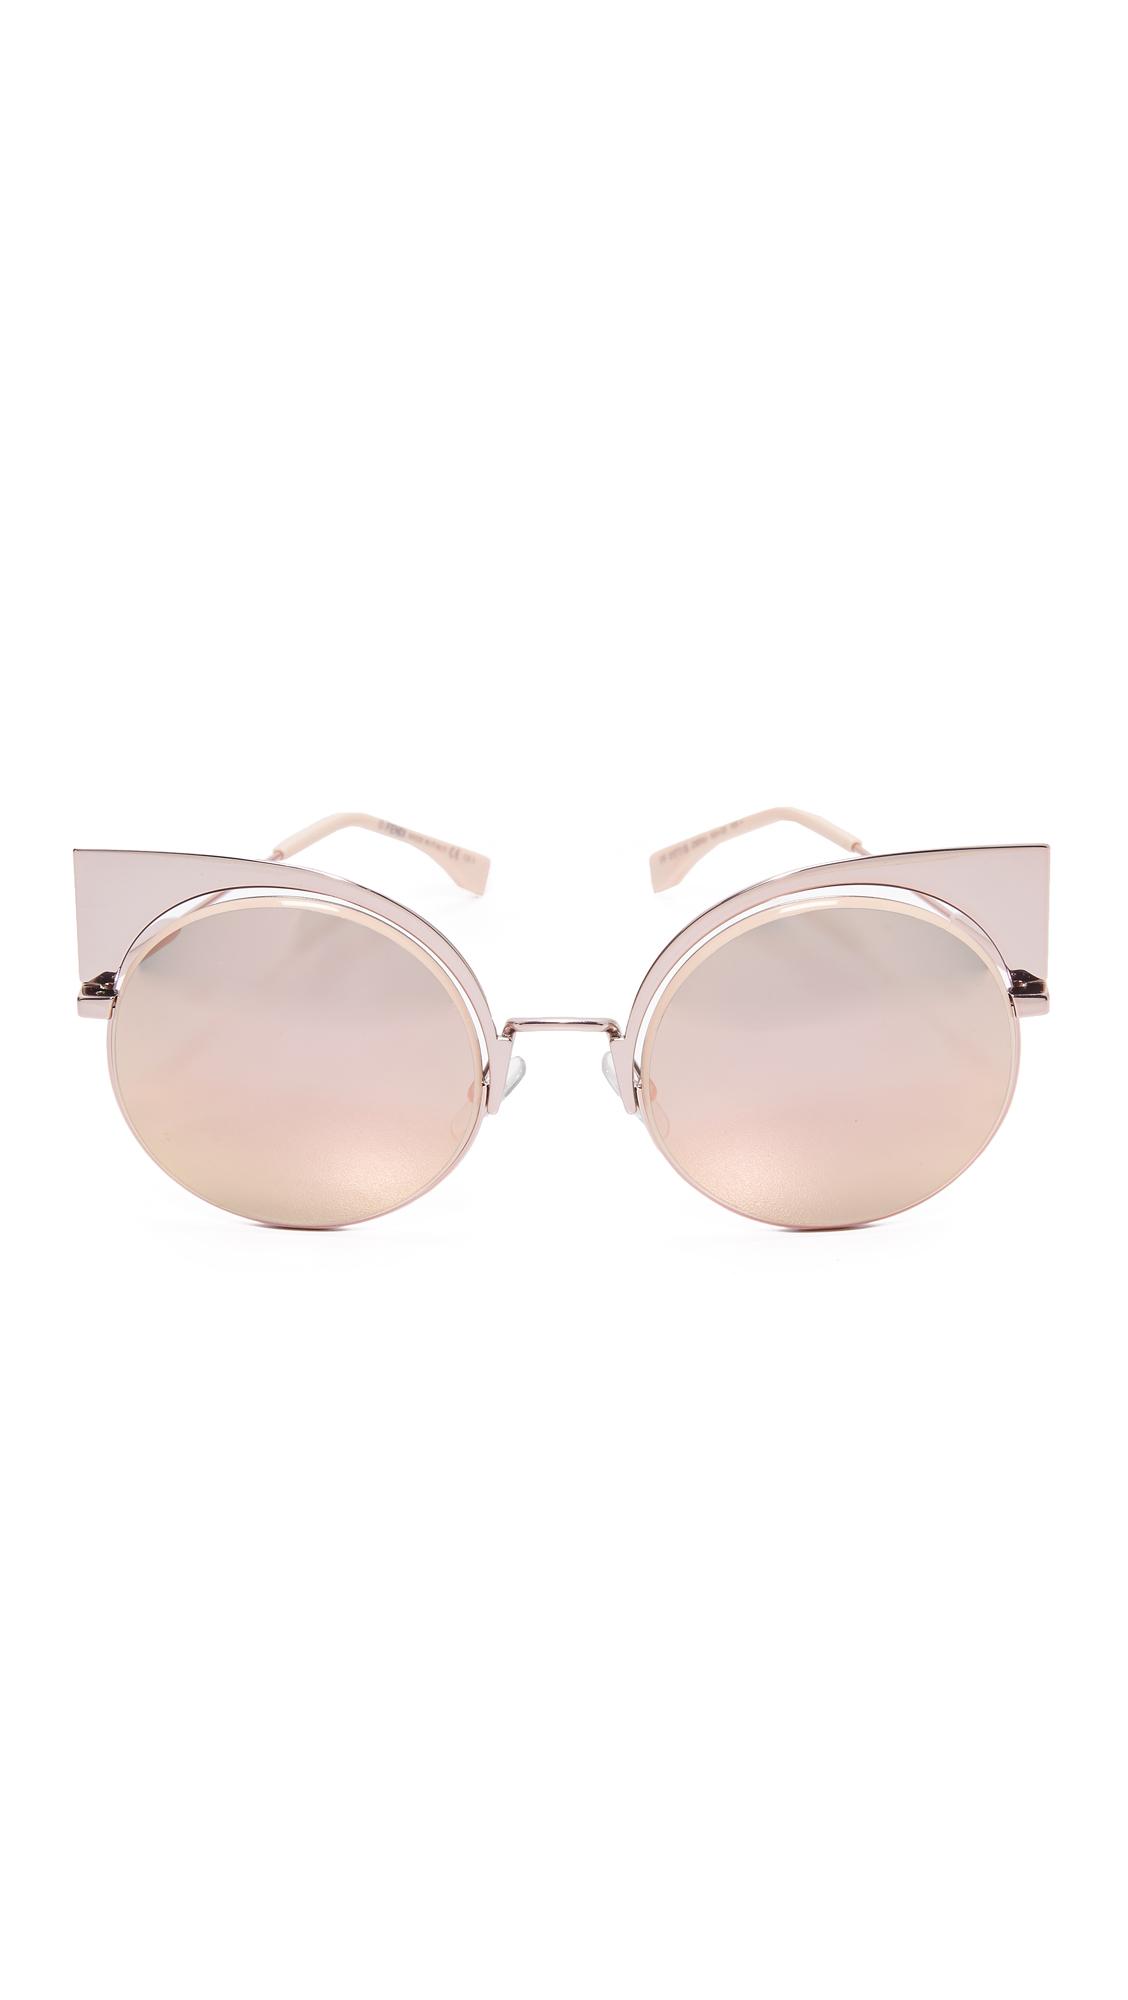 Fendi sol ojos de gato de Gafas de espejo con SwHxXx8q5